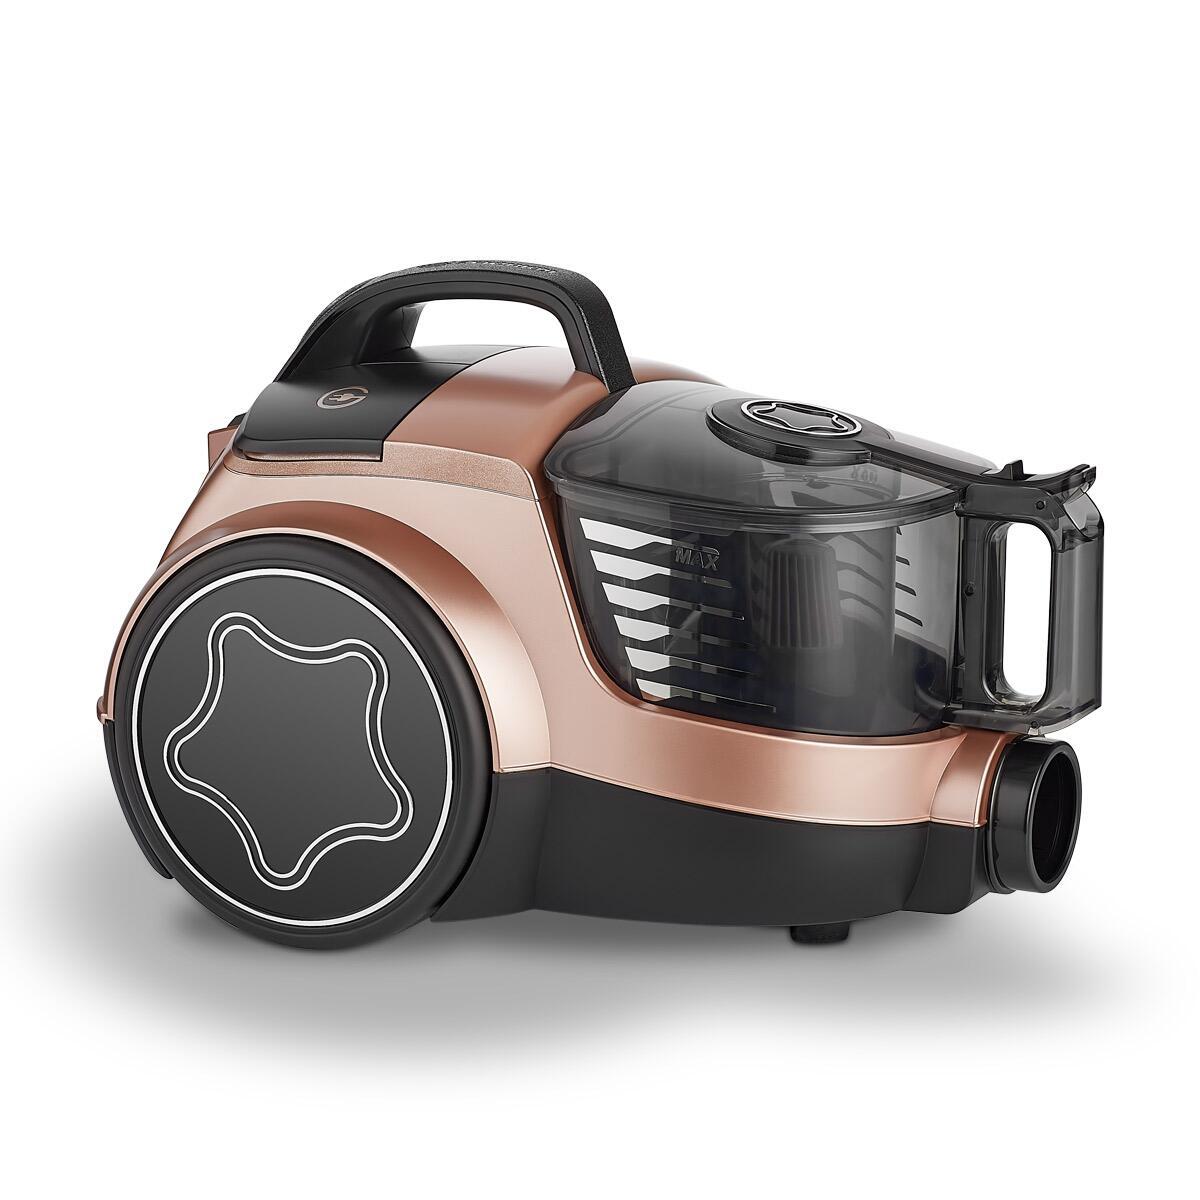 Korkmaz Cosmos Premium Elektrikli Süpürge Rosegold/Siyah